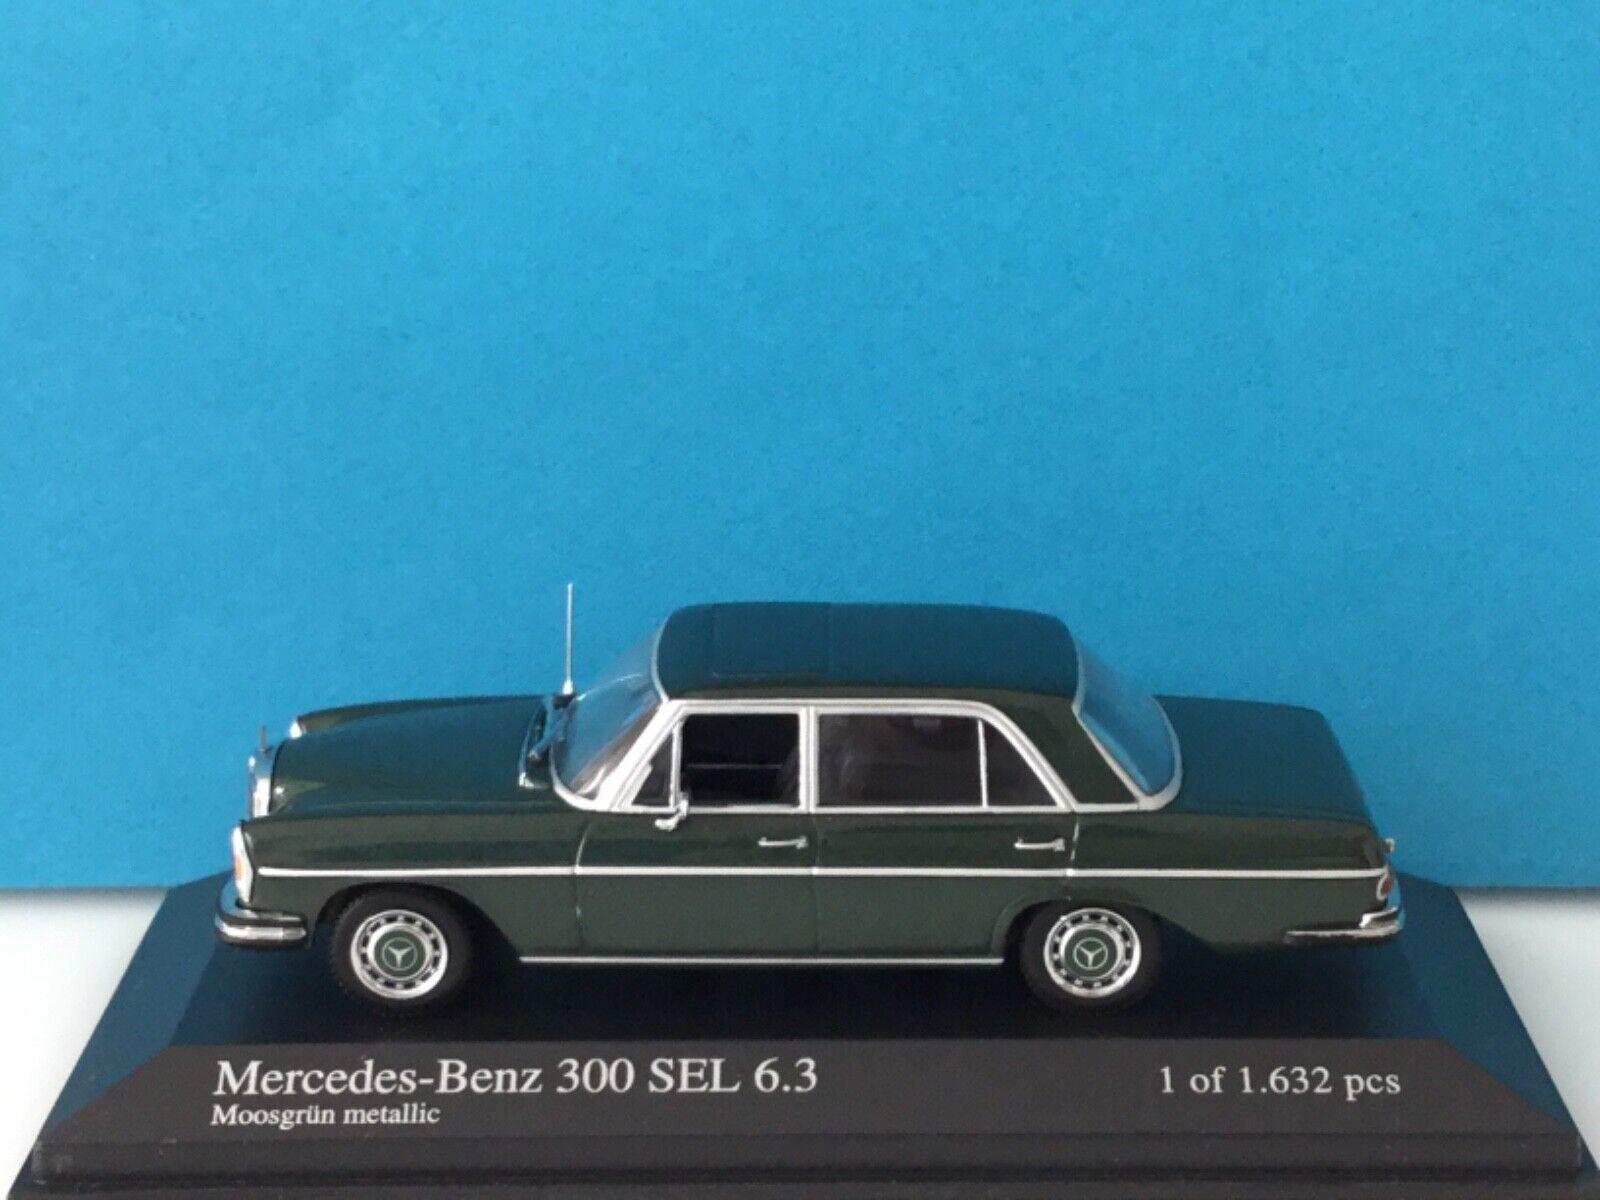 Minichamps 1 43 Mercedes-Benz E-Class Saloon 1993 blu nero met. Nr. 430 033500